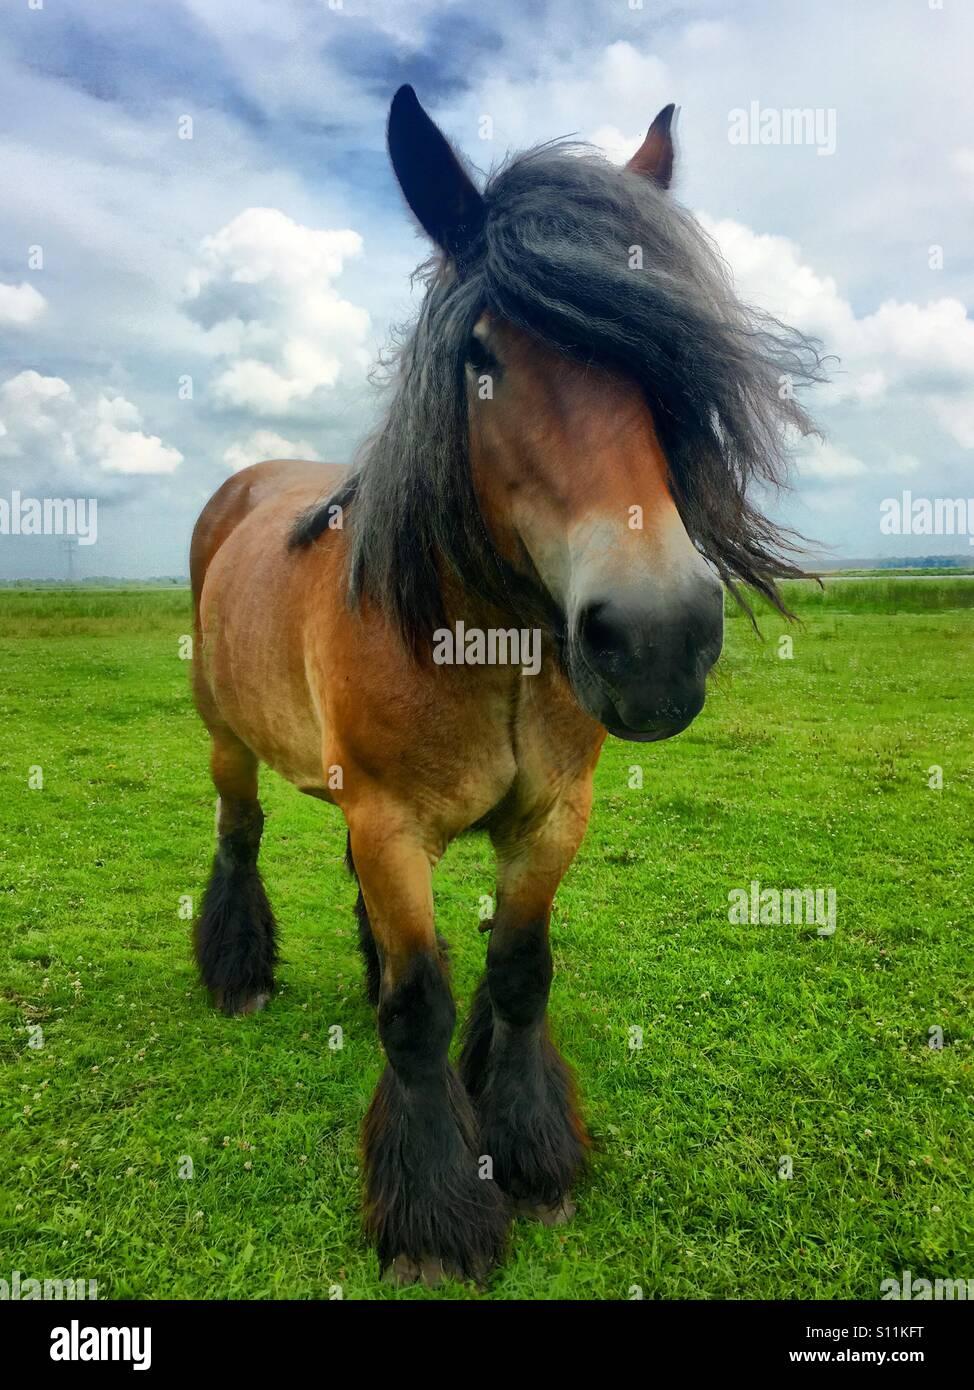 Belgian draft horse against a dark blue sky - Stock Image